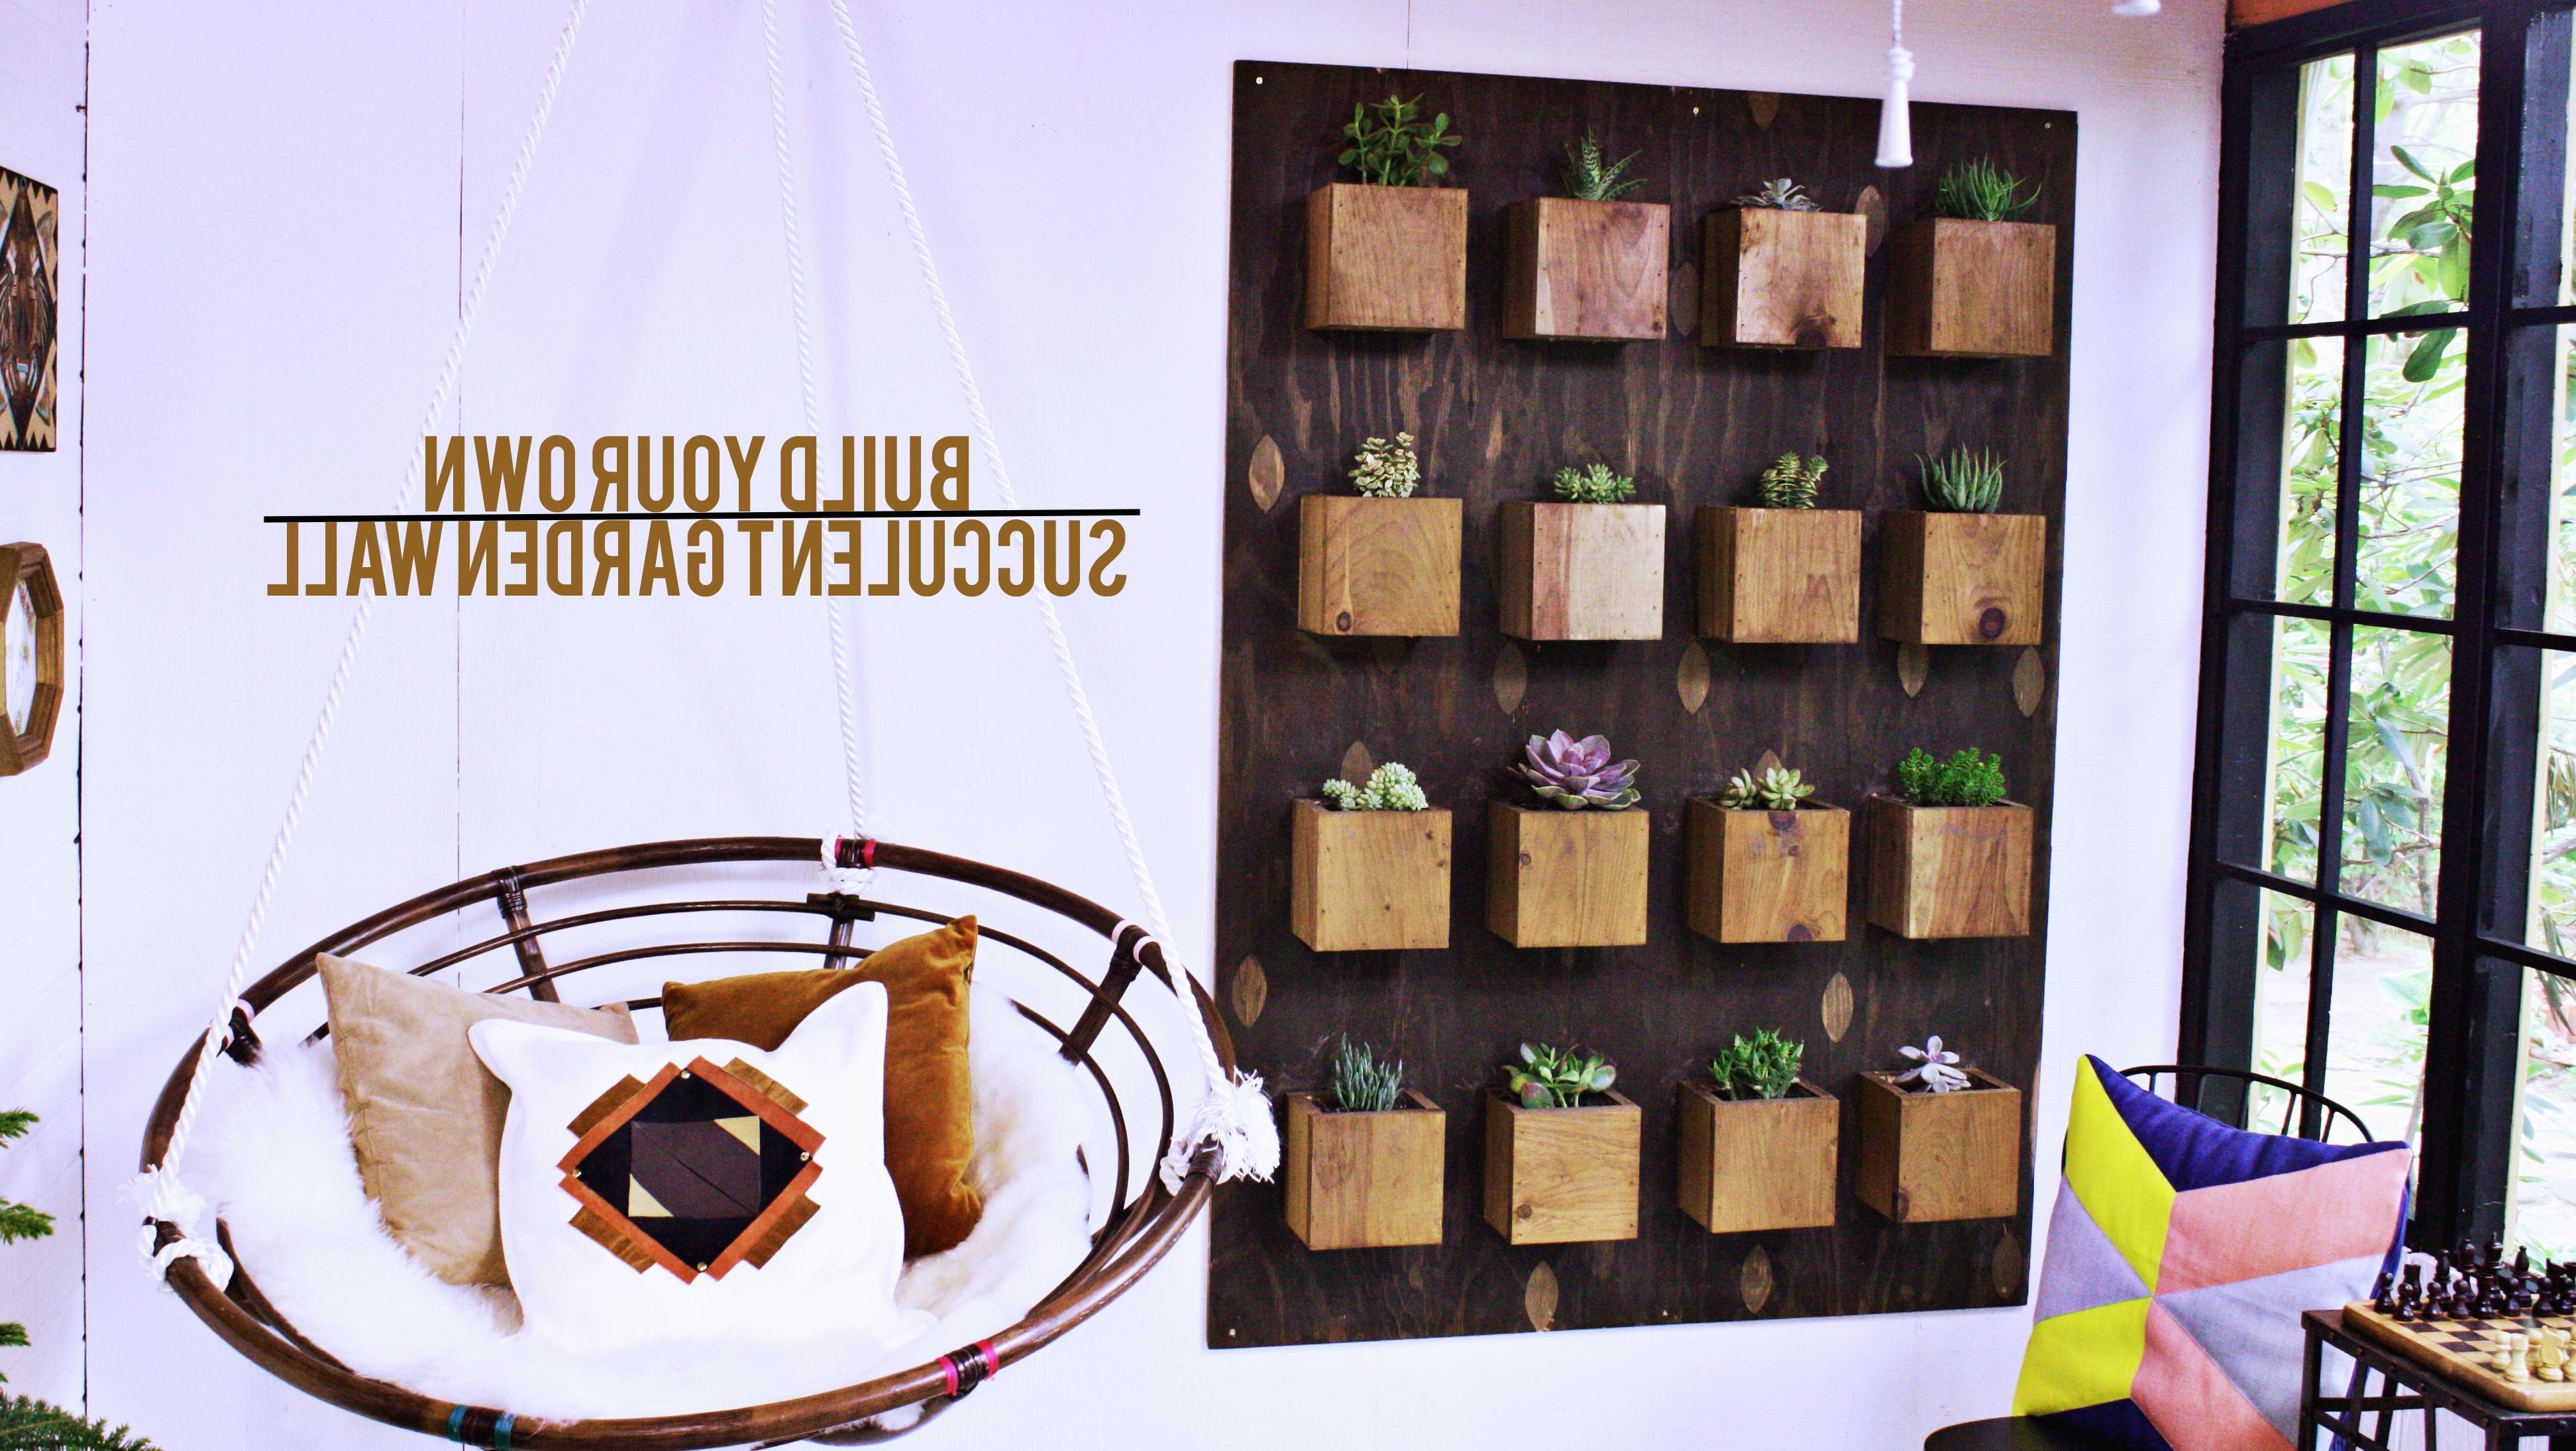 Diy Garden Wall – Urban Sunroom Makeover – East Coast Creative Blog Throughout Most Popular Diy Garden Wall Art (View 5 of 15)